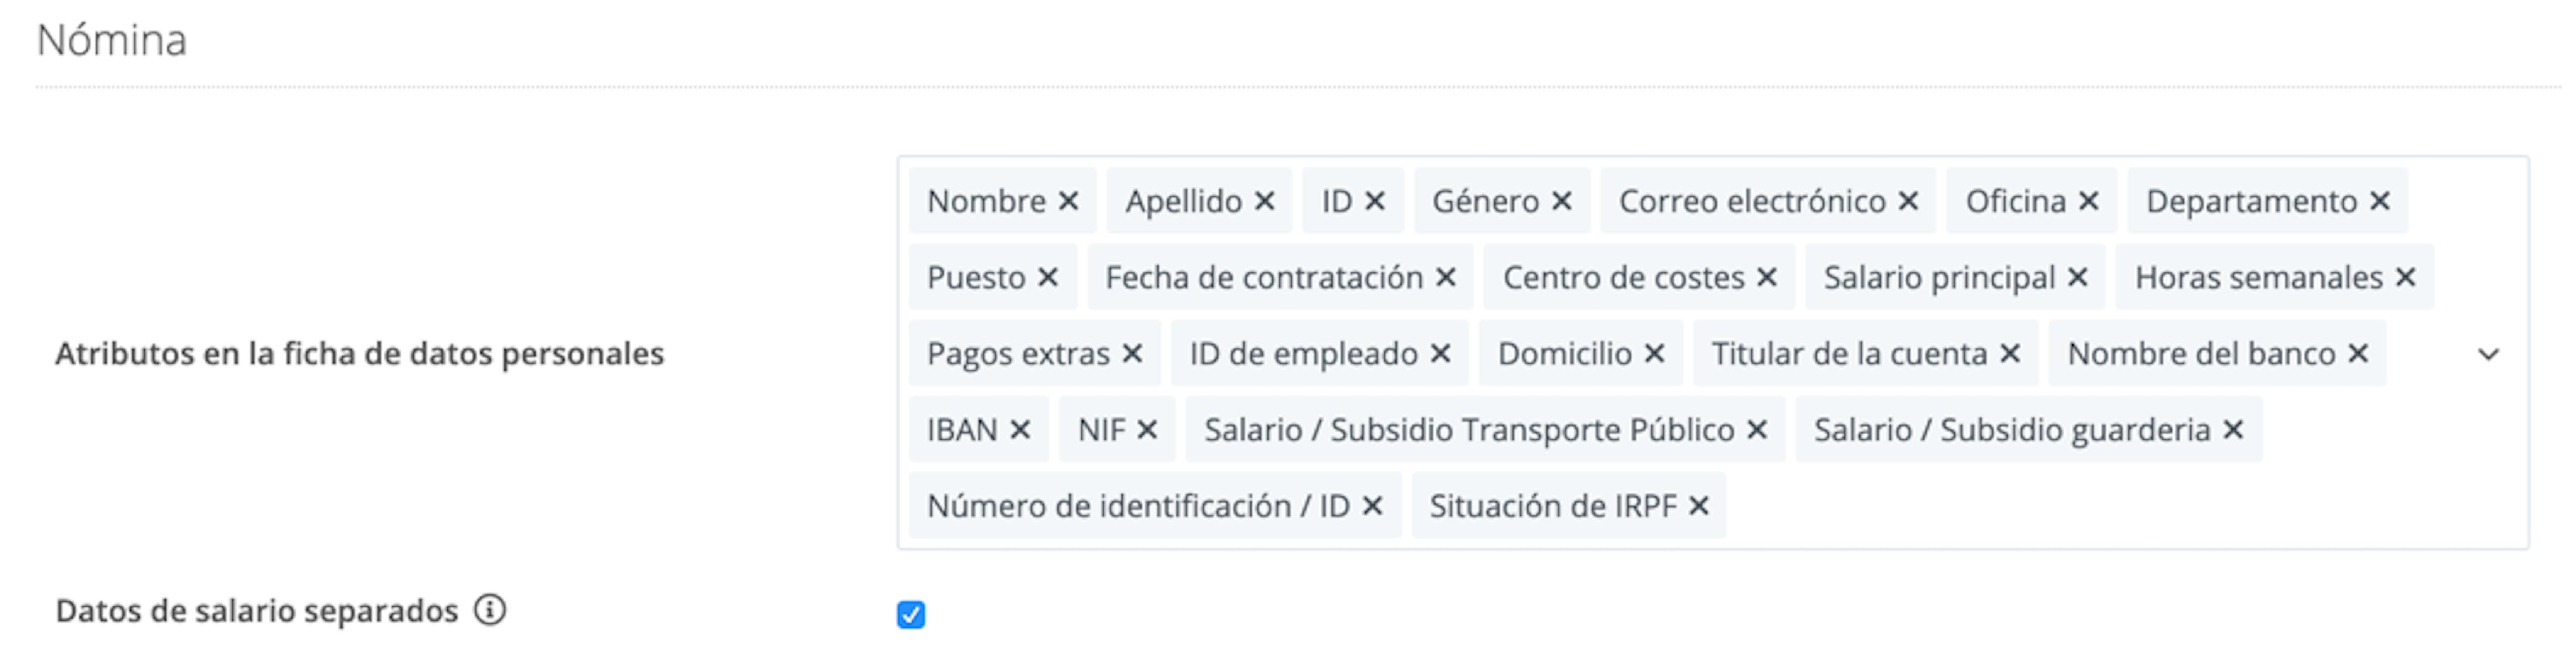 Payroll_Personneldata_Settings_es.png